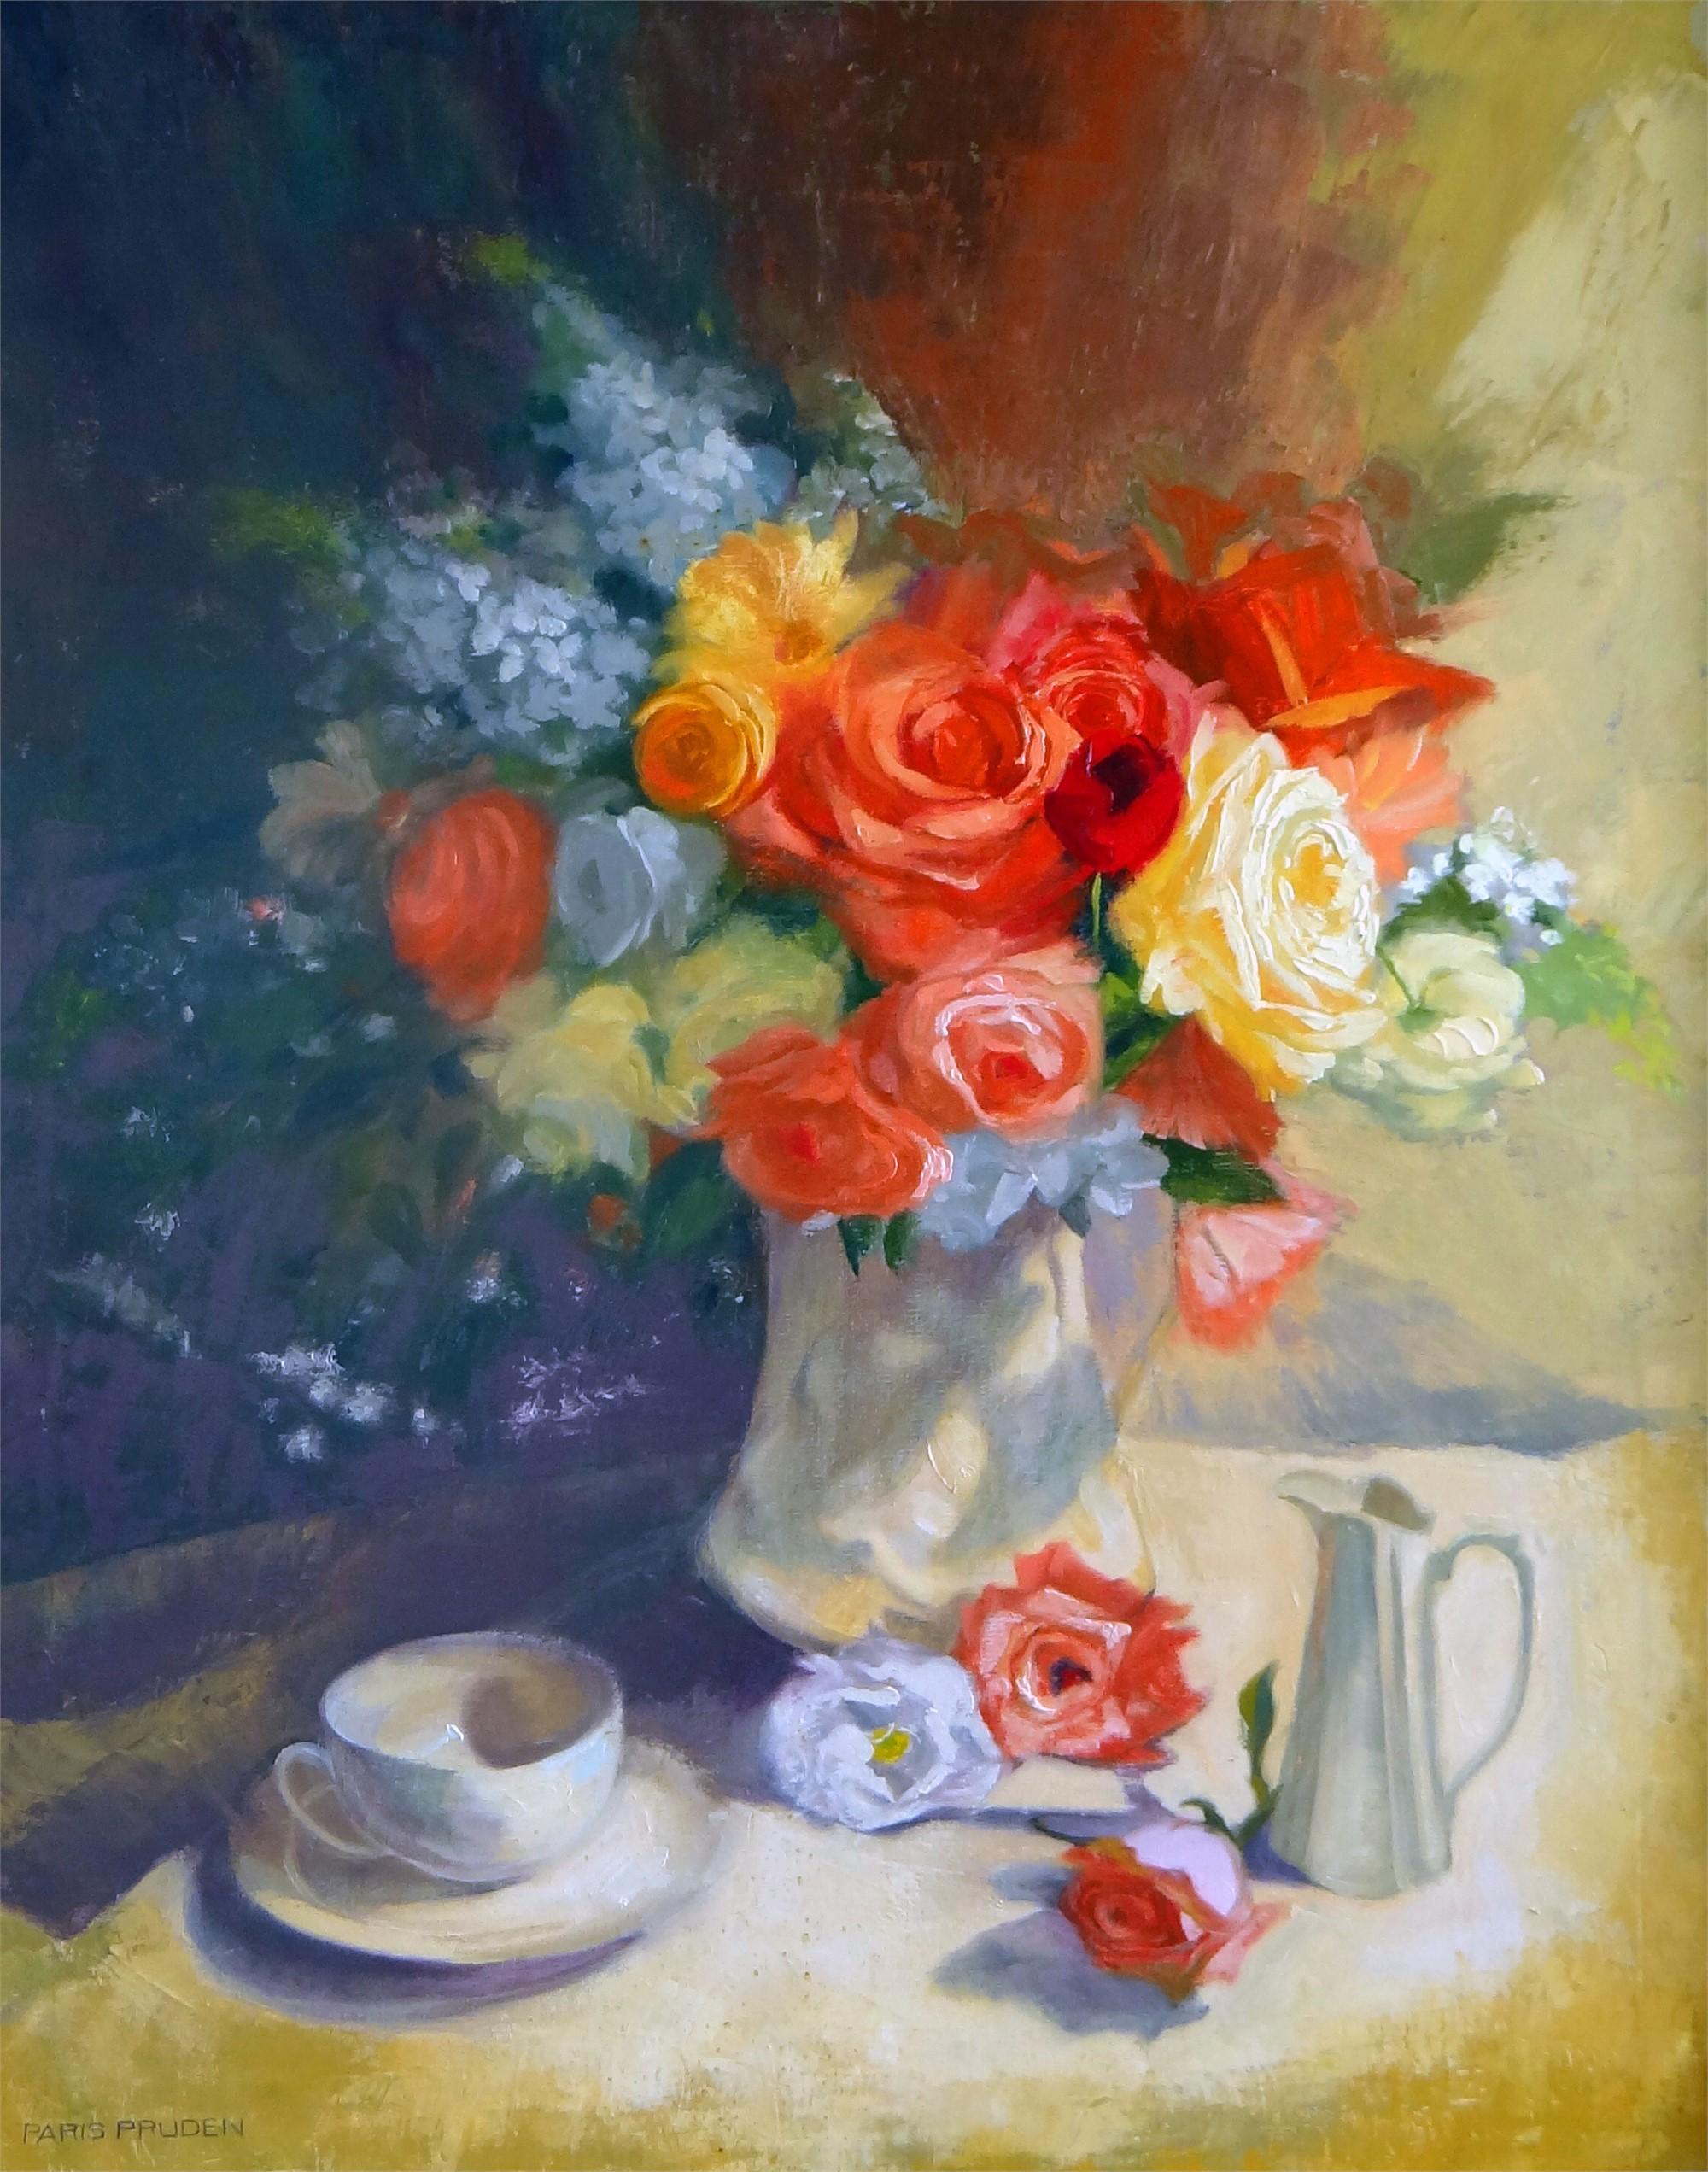 Tea And Roses, 2017 by Nancy Paris Pruden